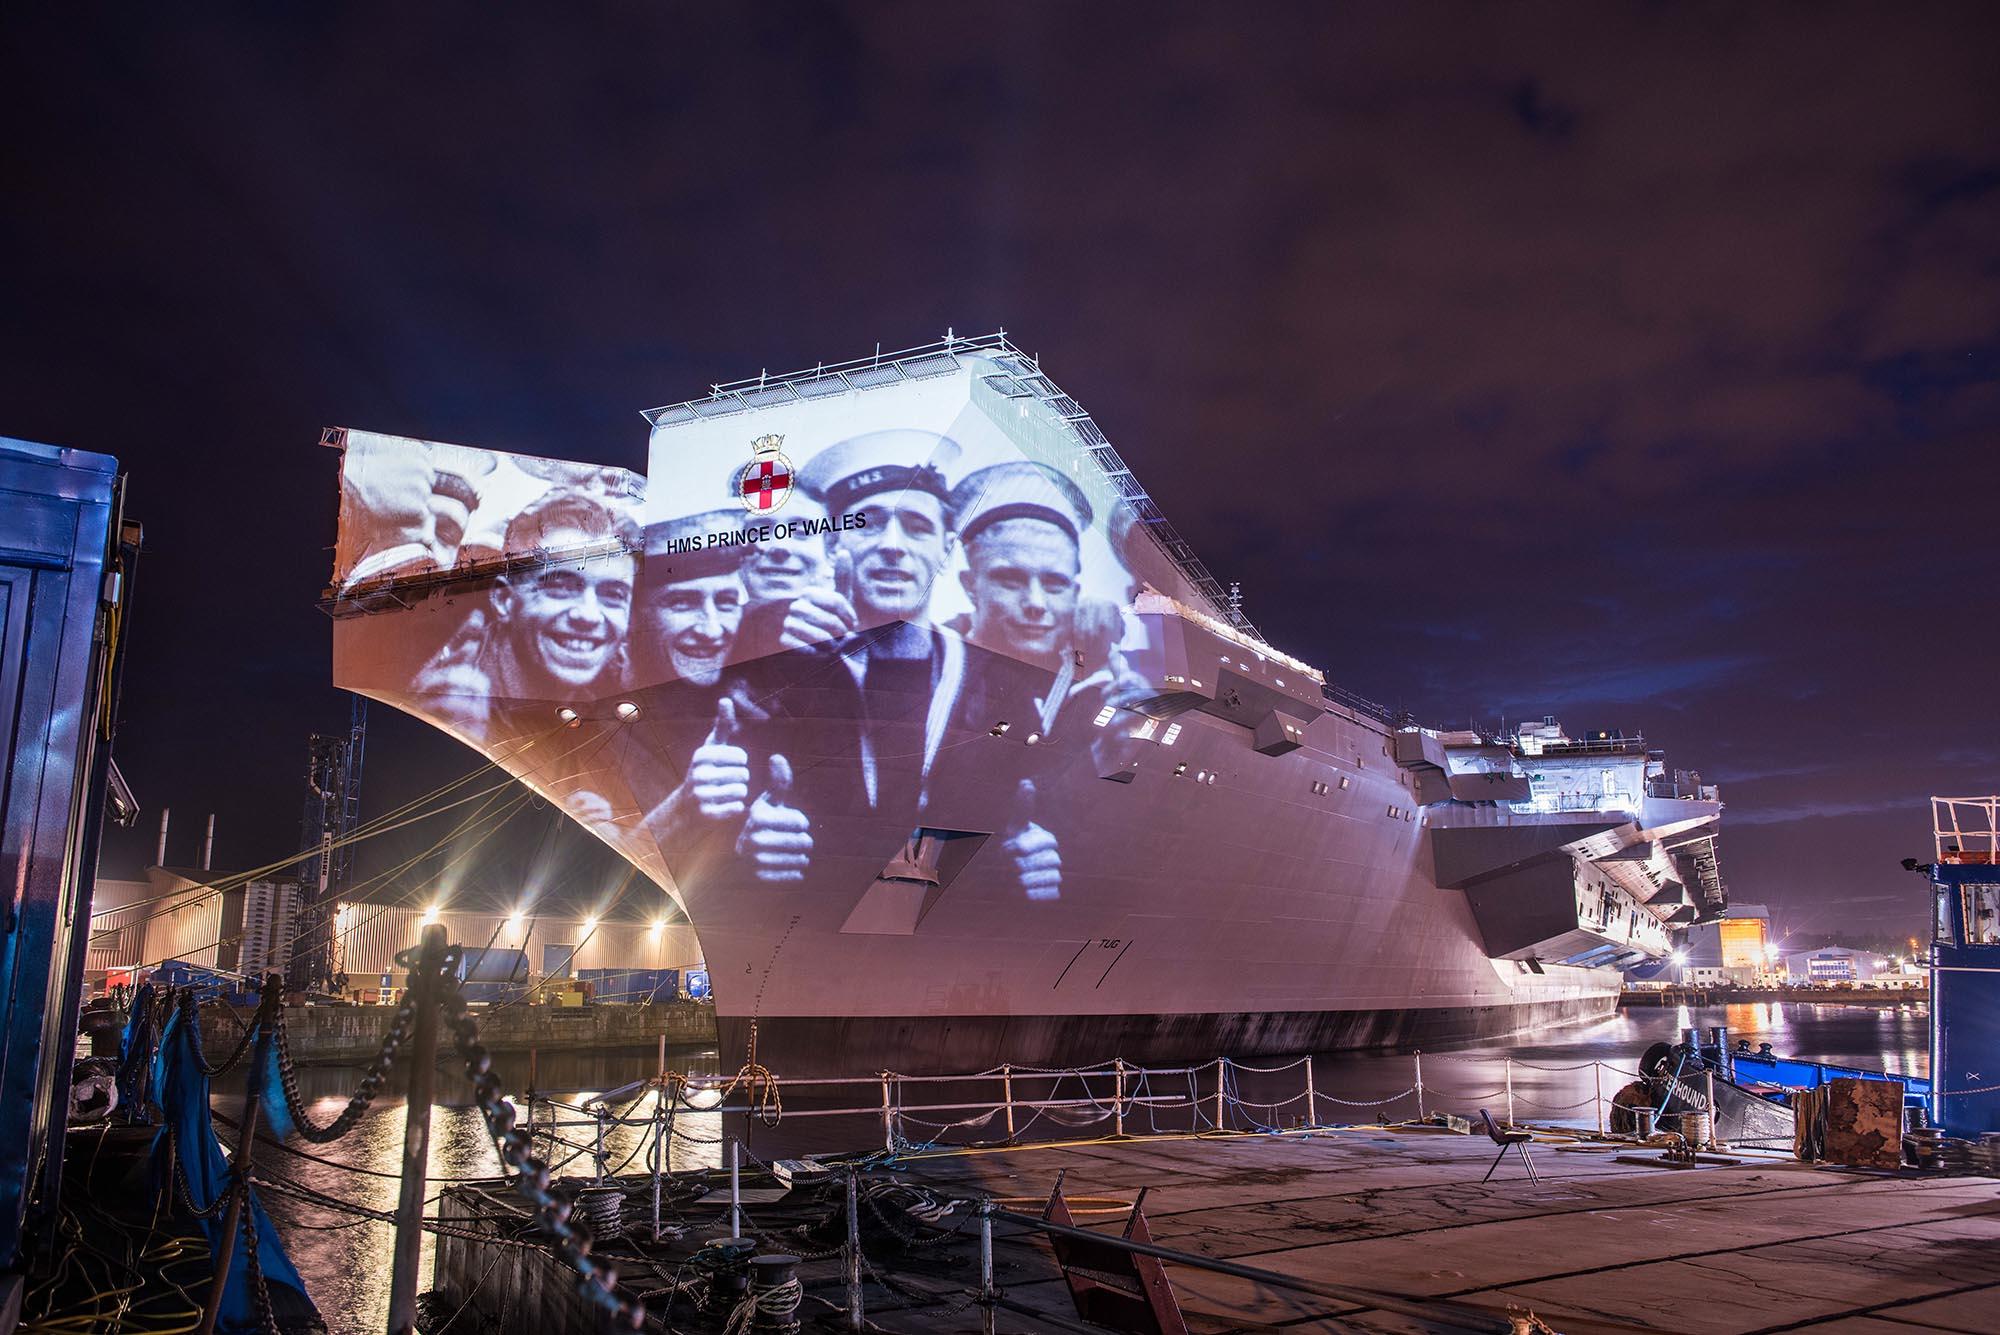 Poppy Scotland projection timelapse film, on HMS Prince of Wales